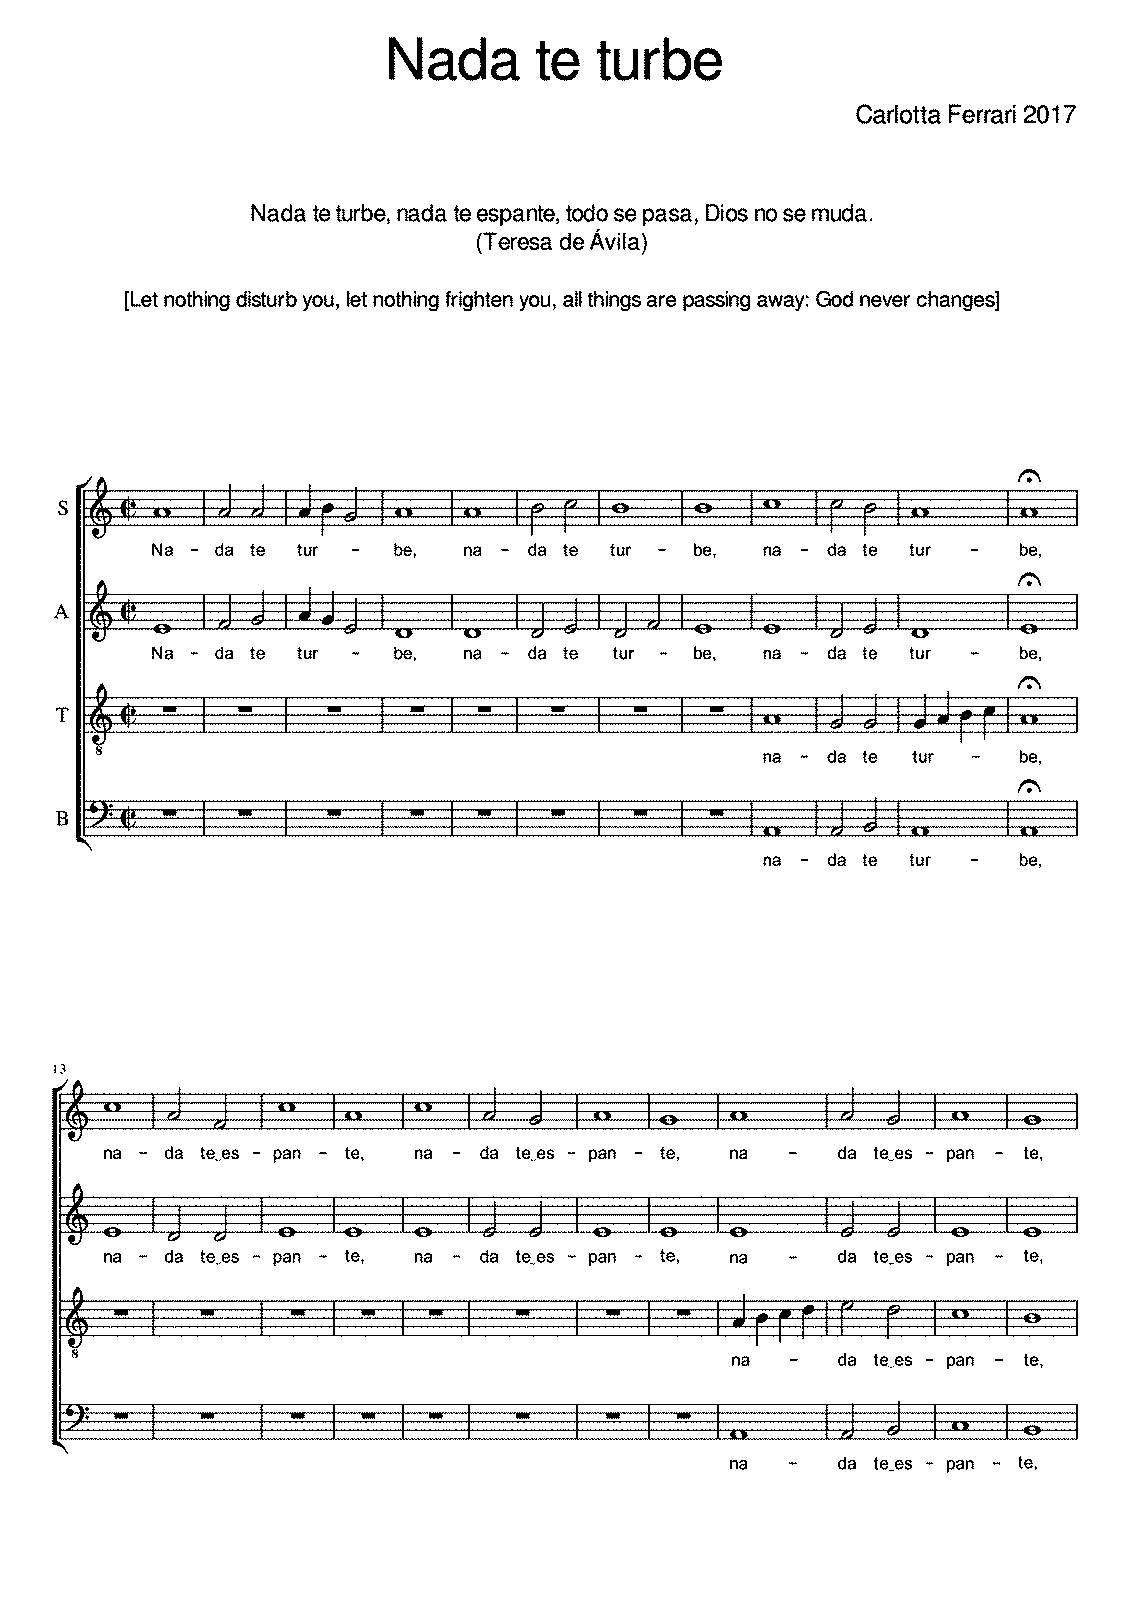 Nada te turbe (Ferrari, Carlotta) - IMSLP/Petrucci Music Library ...